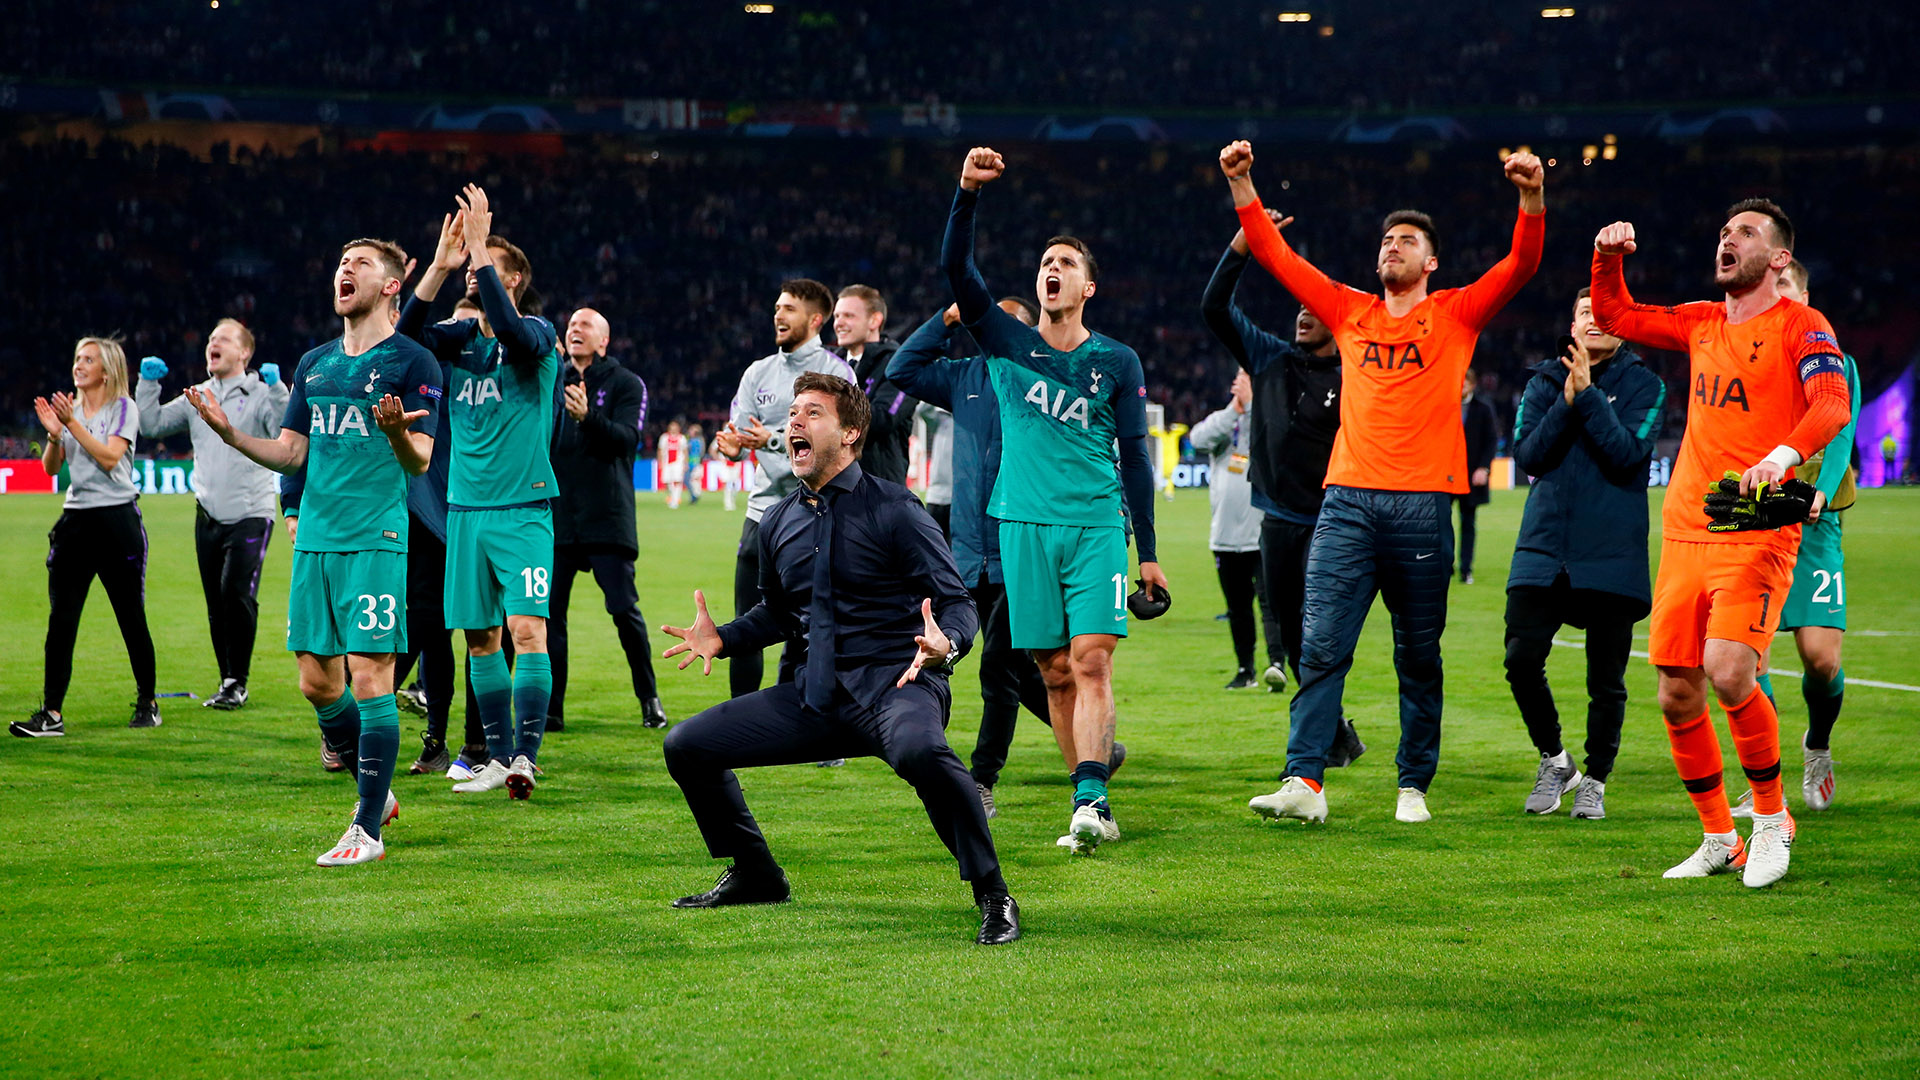 Con triplete de Lucas Moura, Tottenham se clasifica a la primera final de Champions League de su historia